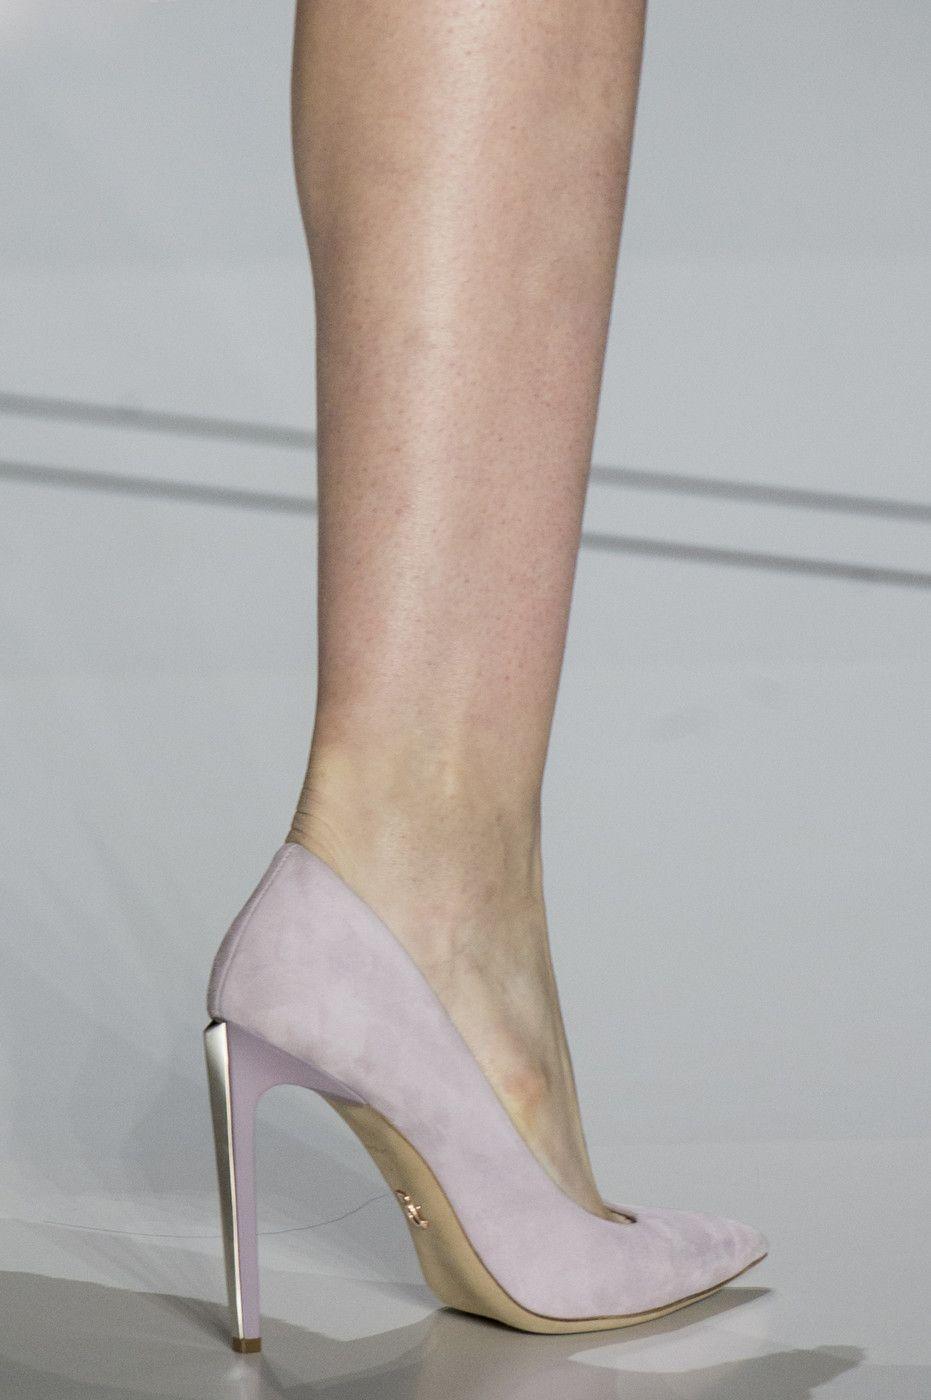 CHAUSSURES - EscarpinsShoes Couture RvjMY